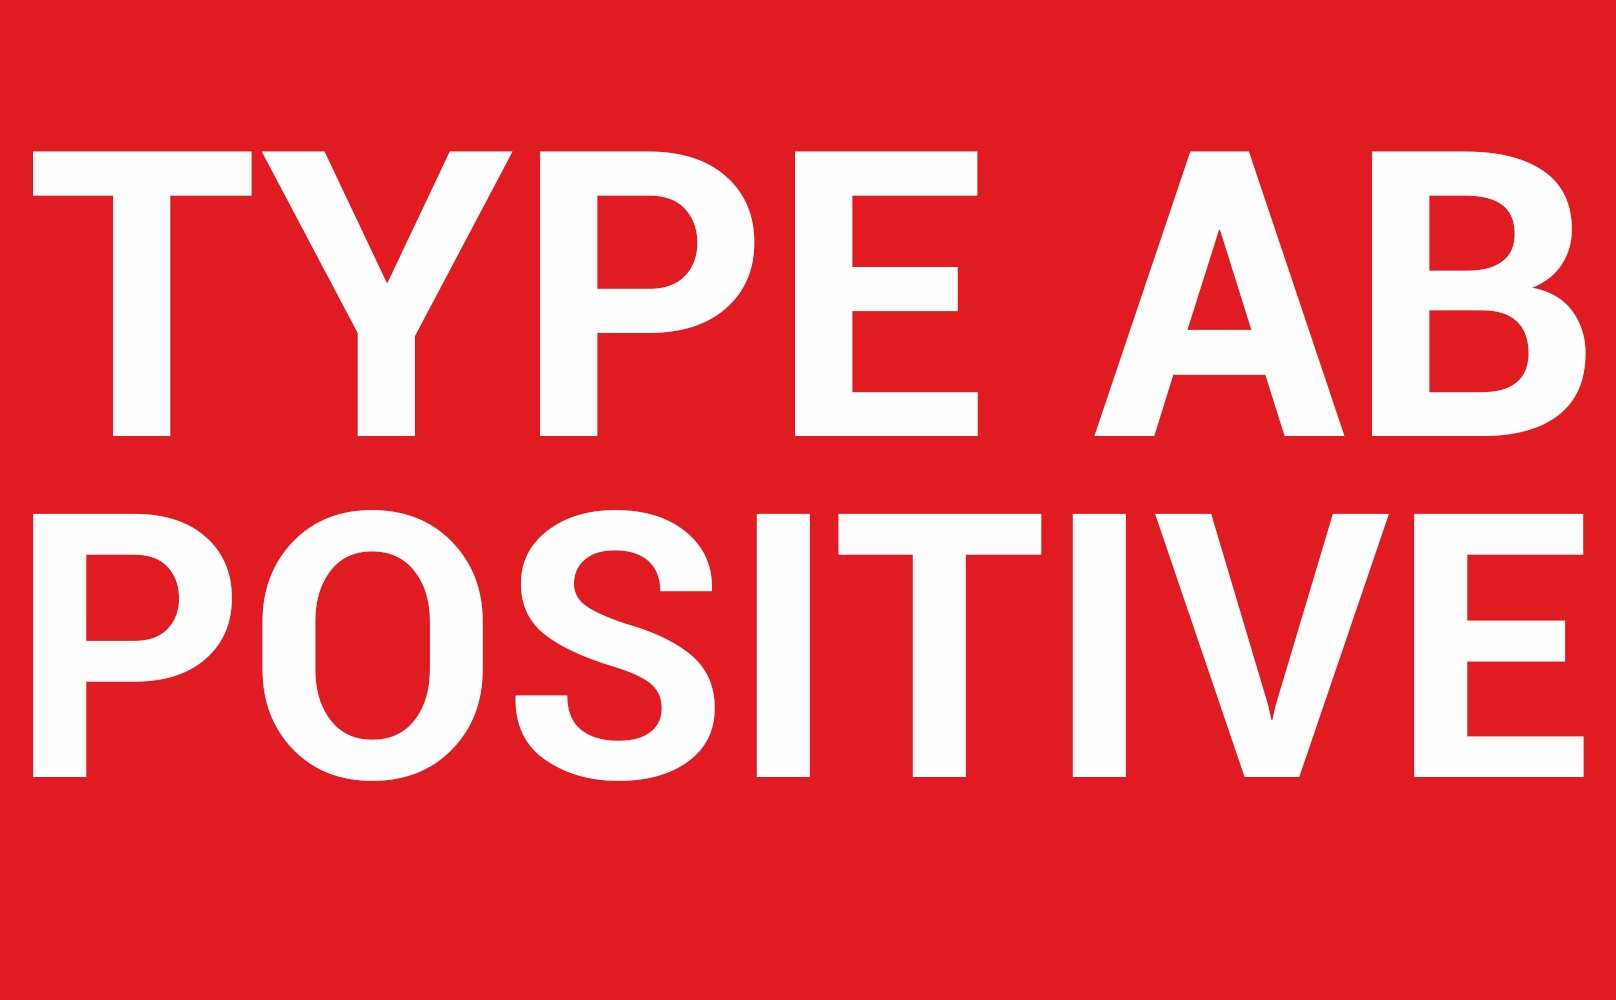 ab positive  ab negative blood